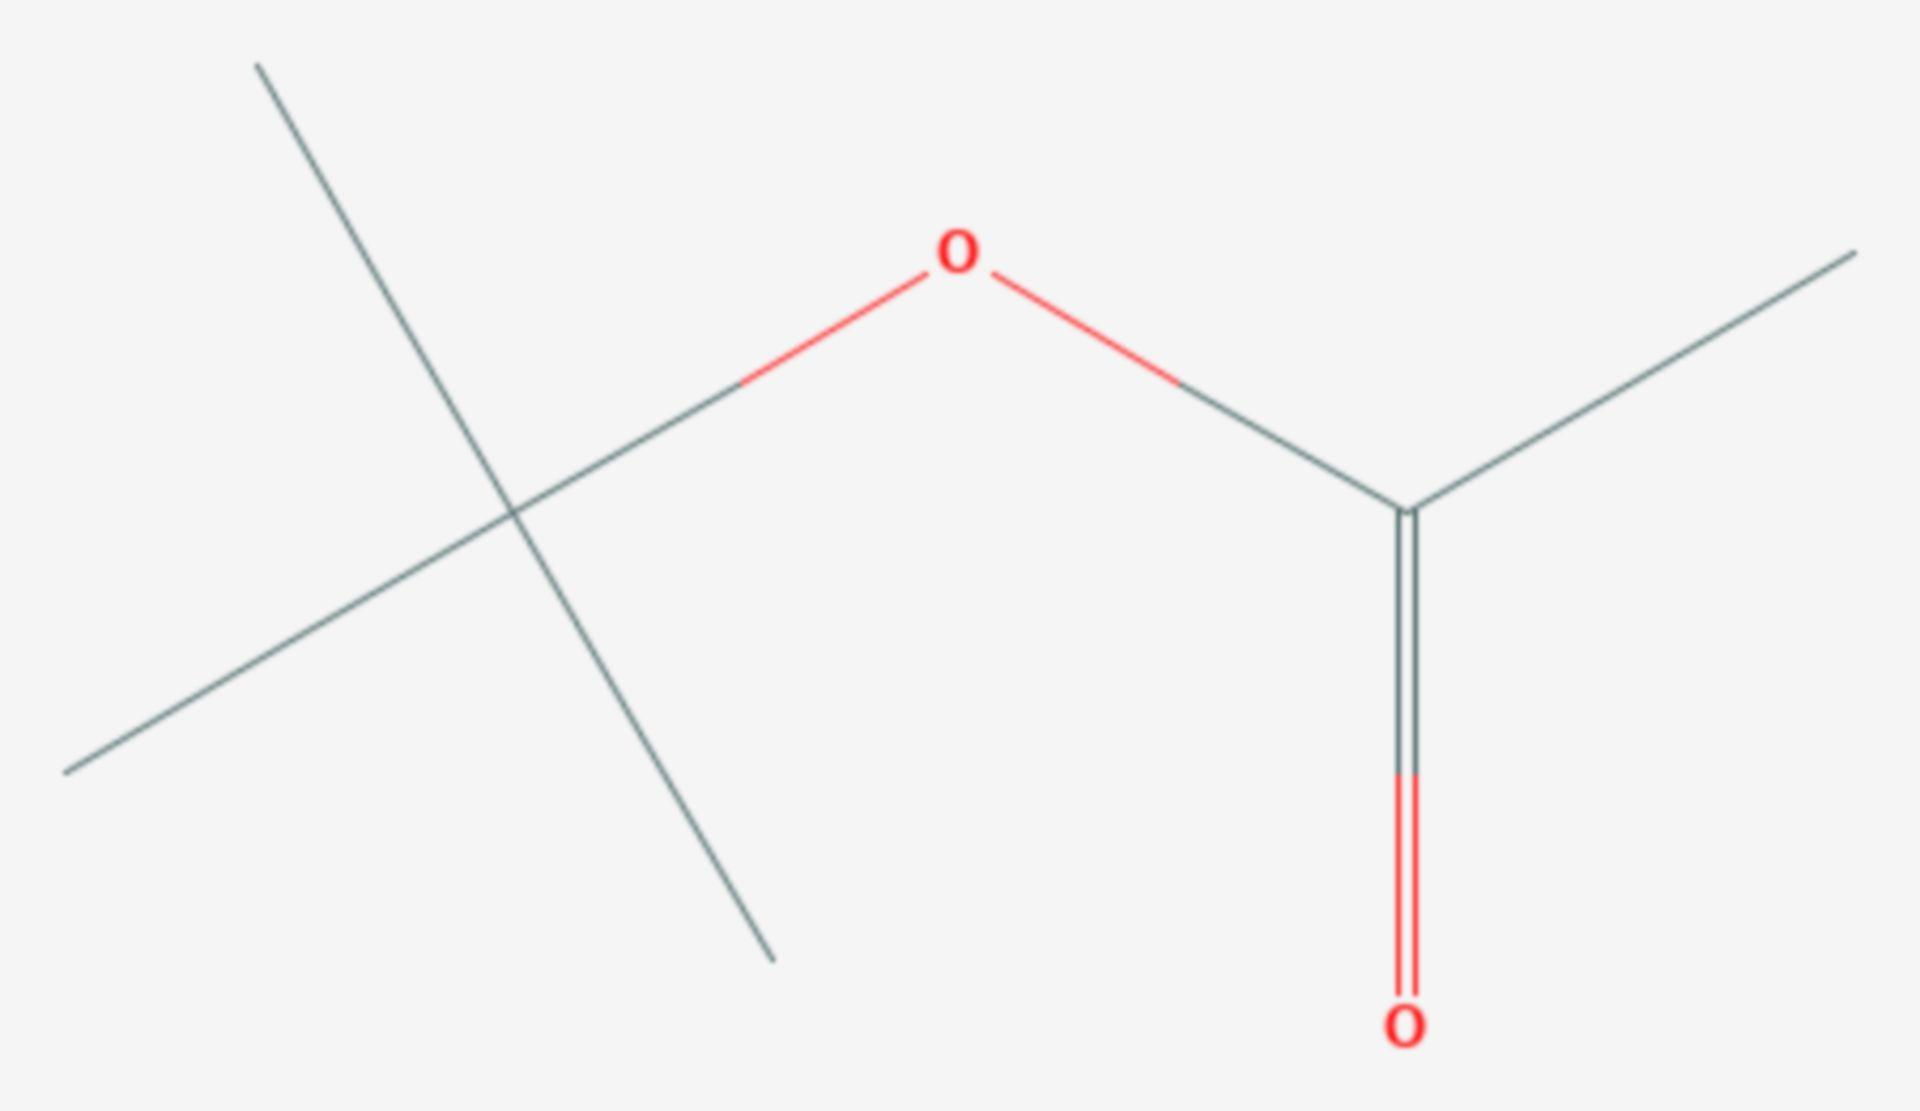 Essigsäure-tert-butylester (Strukturformel)